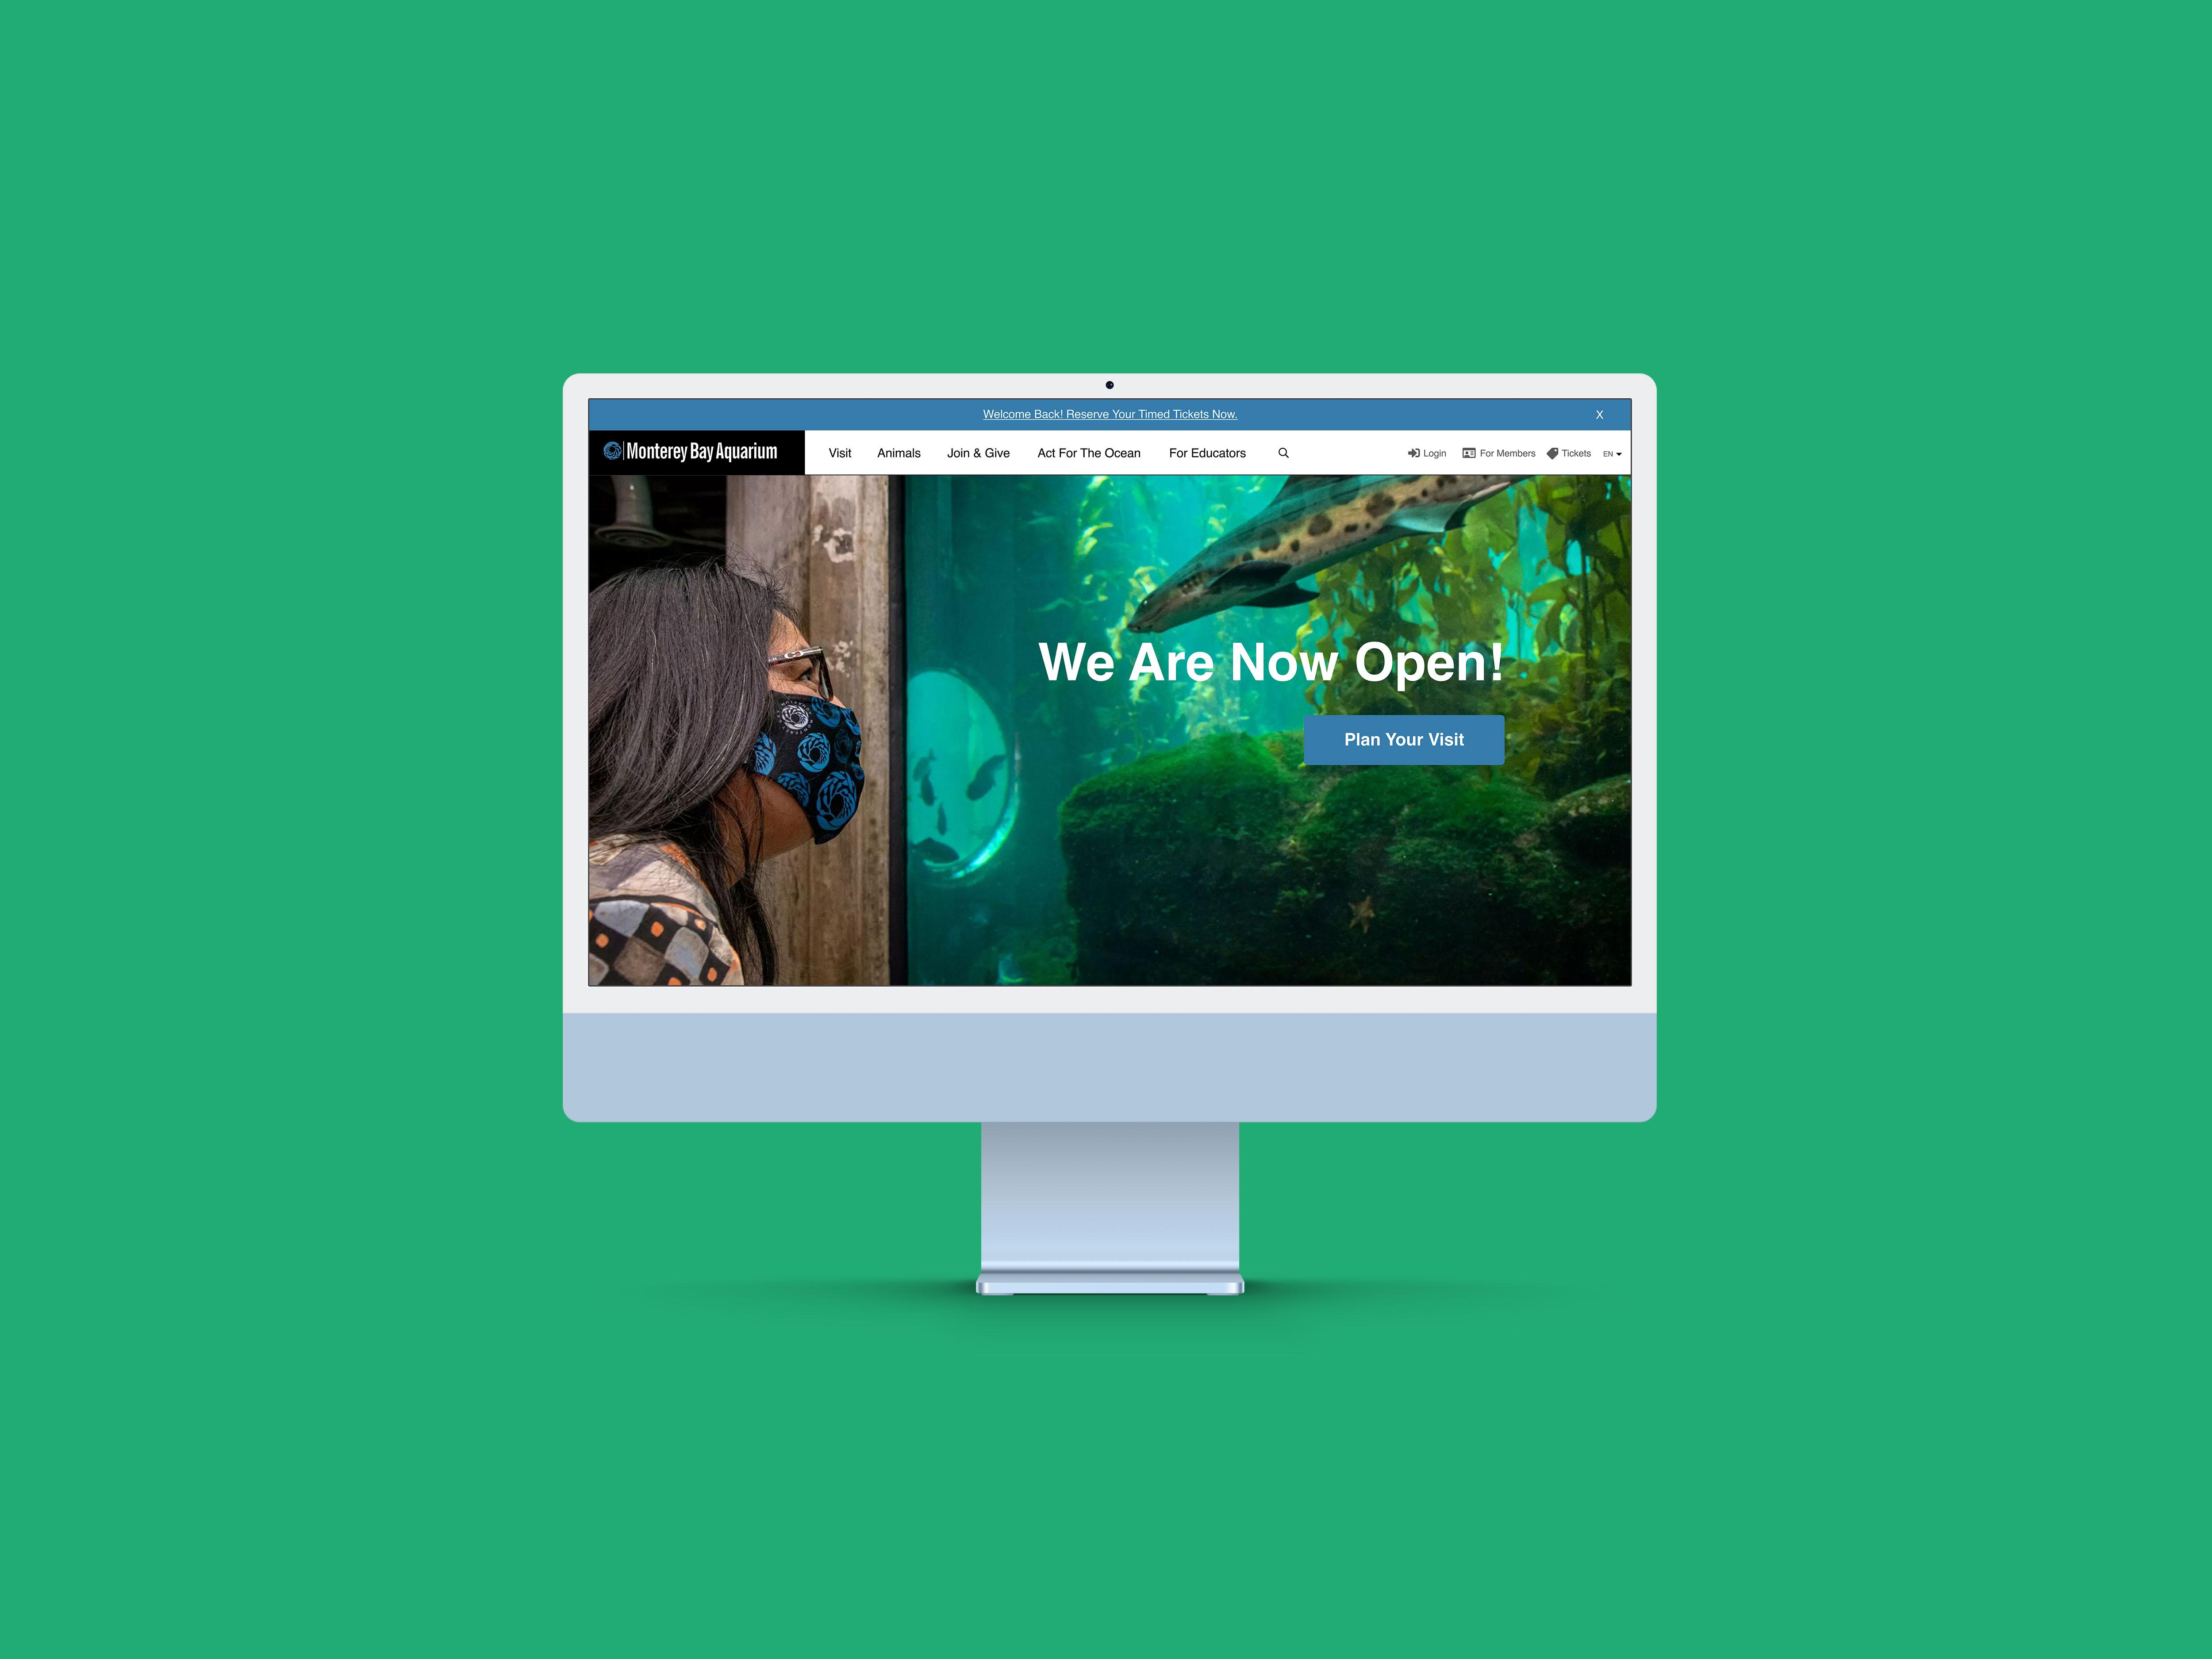 Desktop screen displaying the homepage for Monterey Bay Aquarium